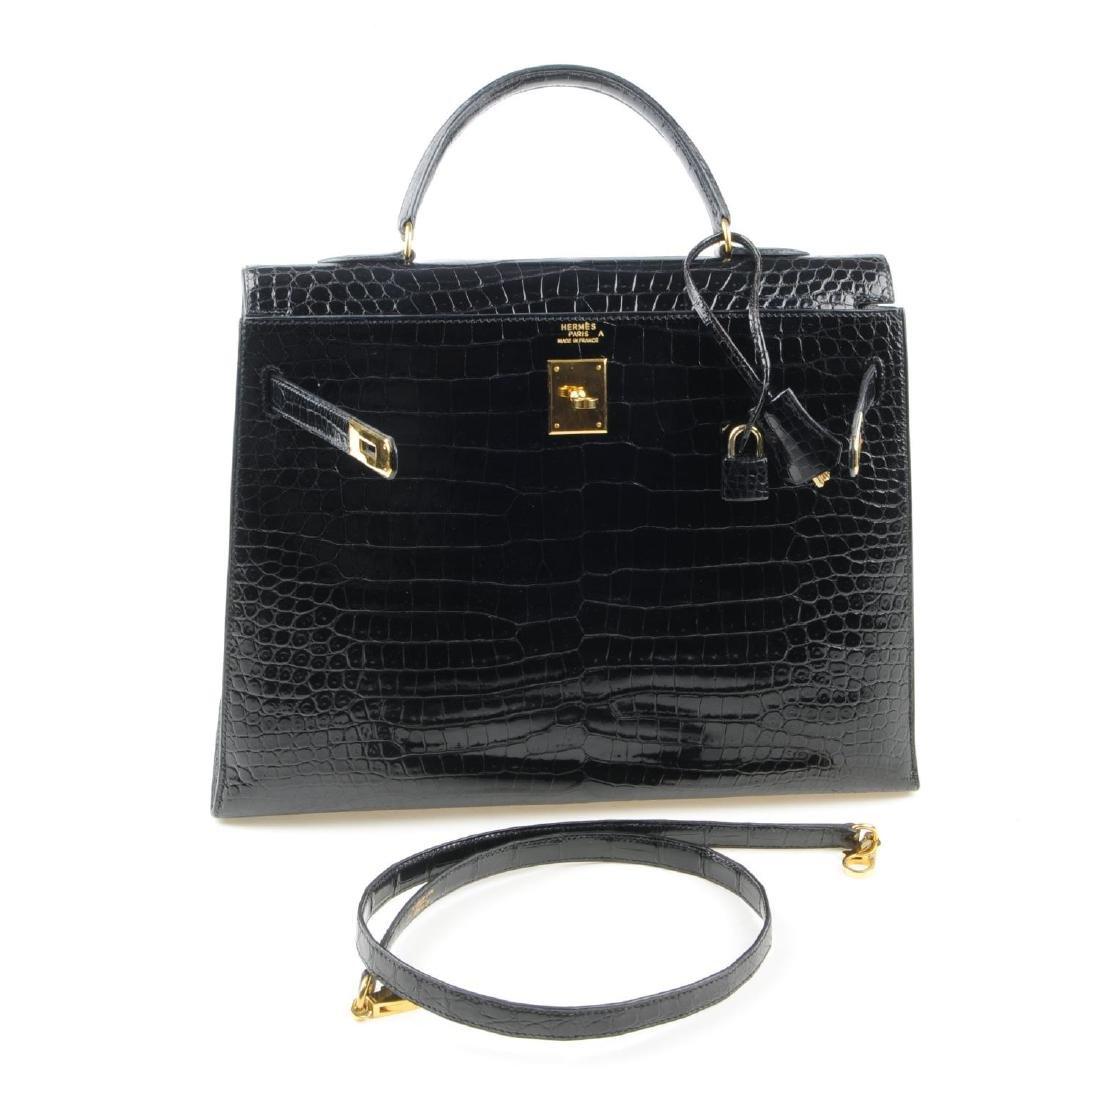 HERMÈS - a black Porosus Crocodile Kelly 35 handbag. - 5